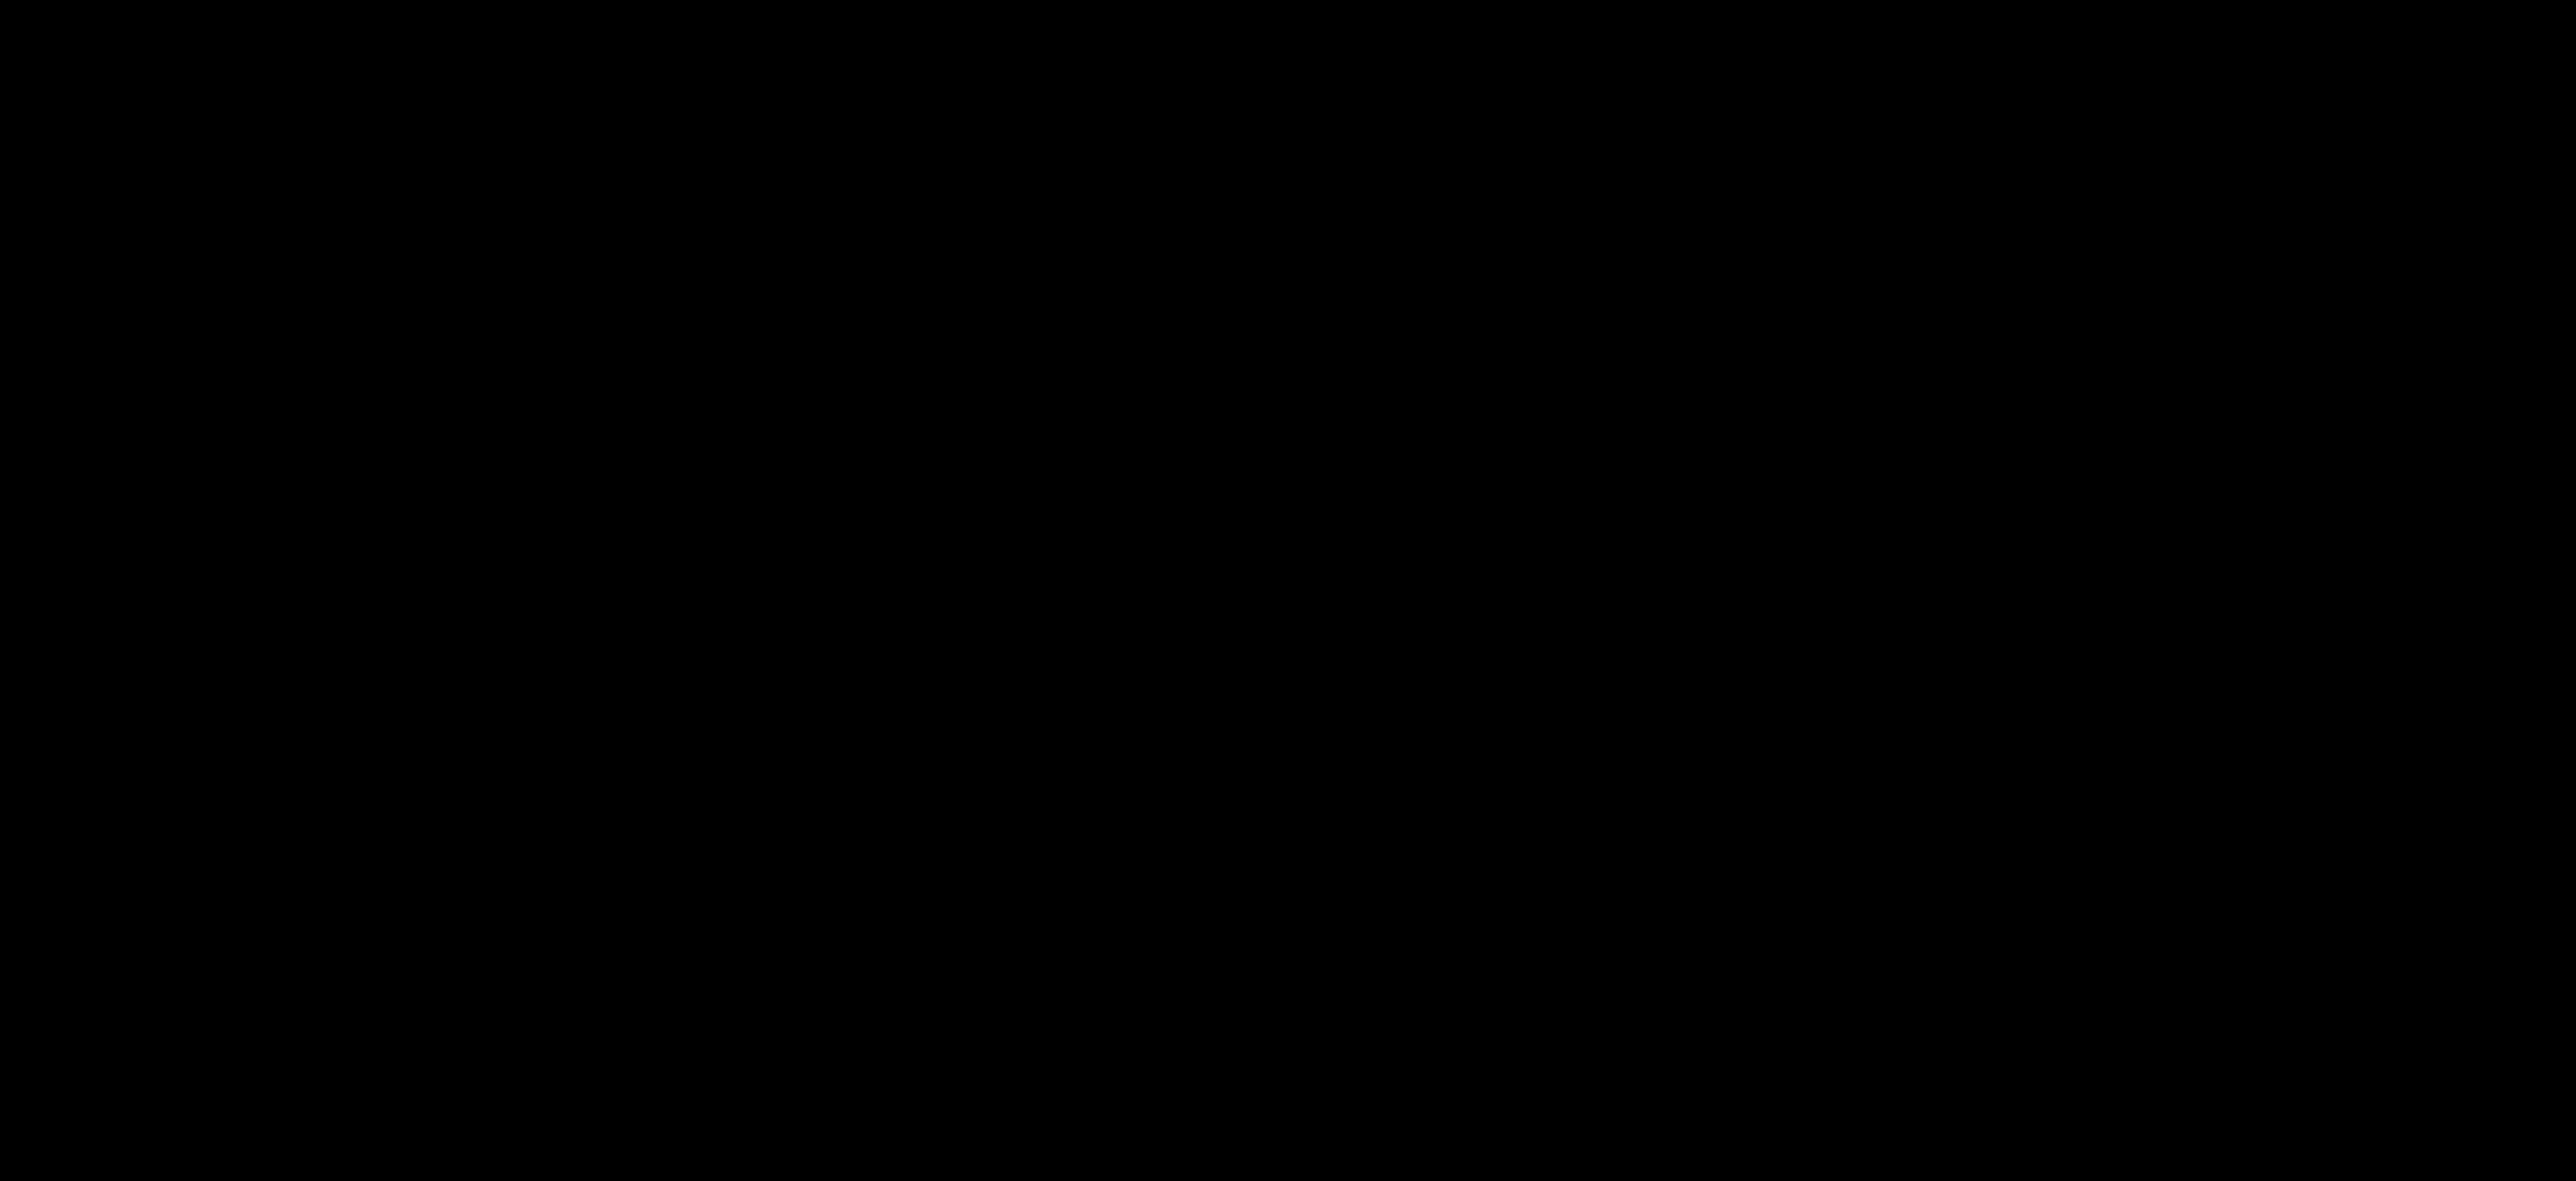 autocad-lt-logotype-1-line-no-year-screen